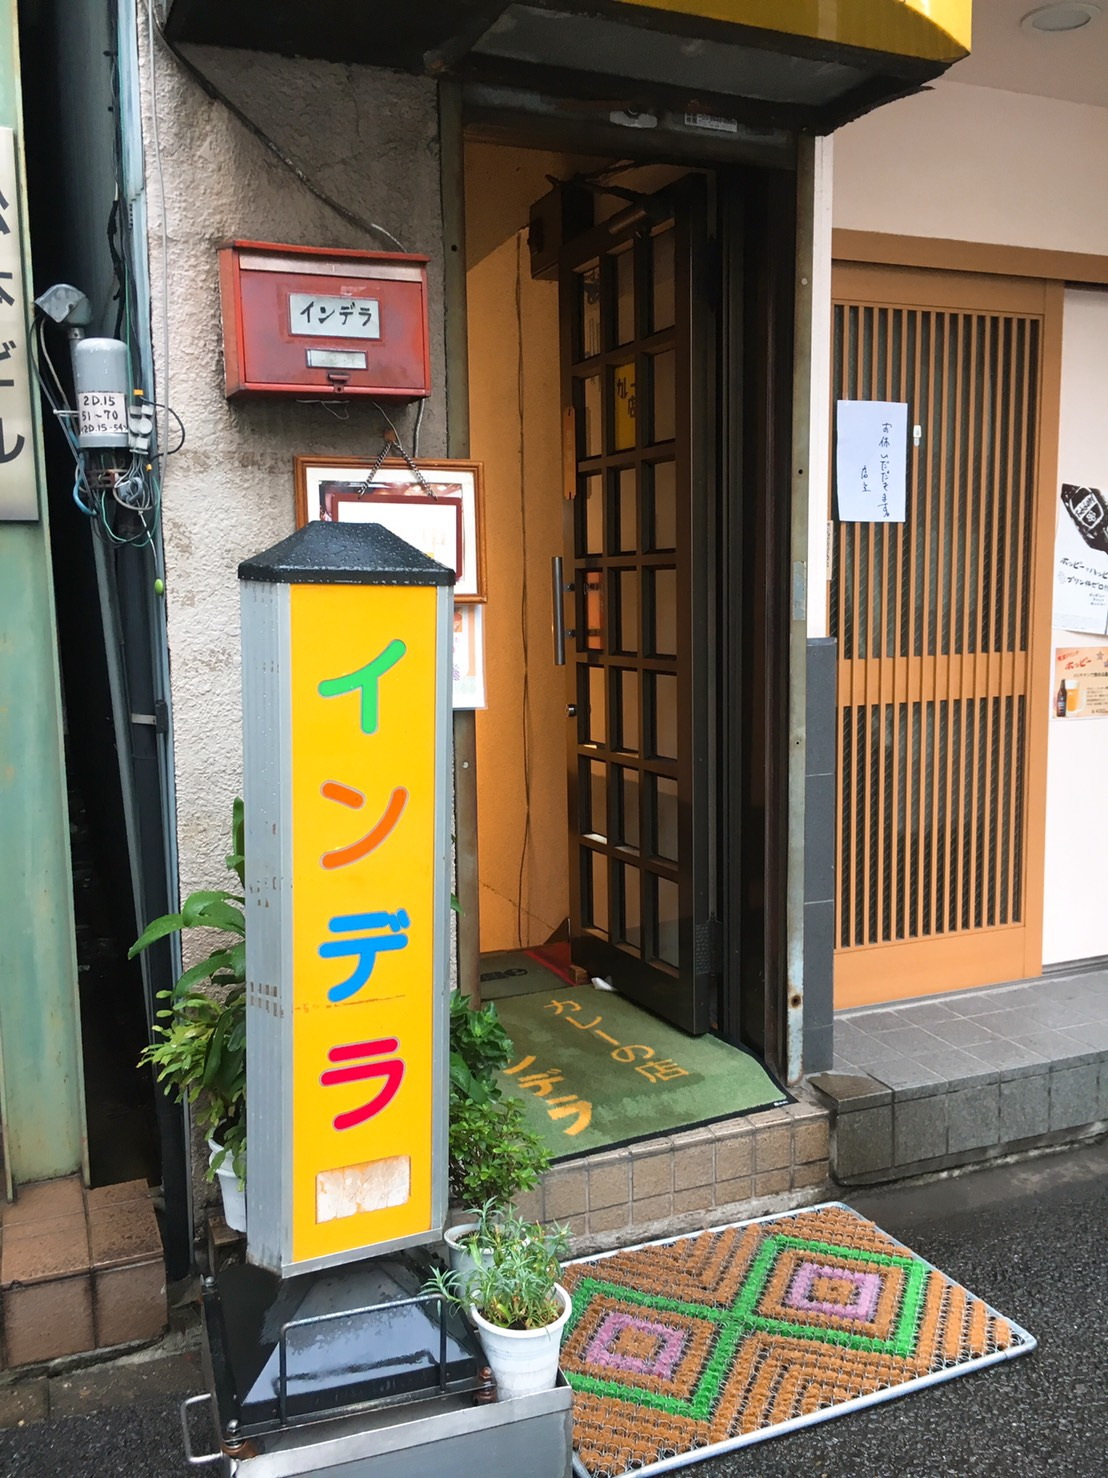 https://www.machikado-creative.jp/wordpress/wp-content/uploads/2017/09/S_6682940751685.jpg